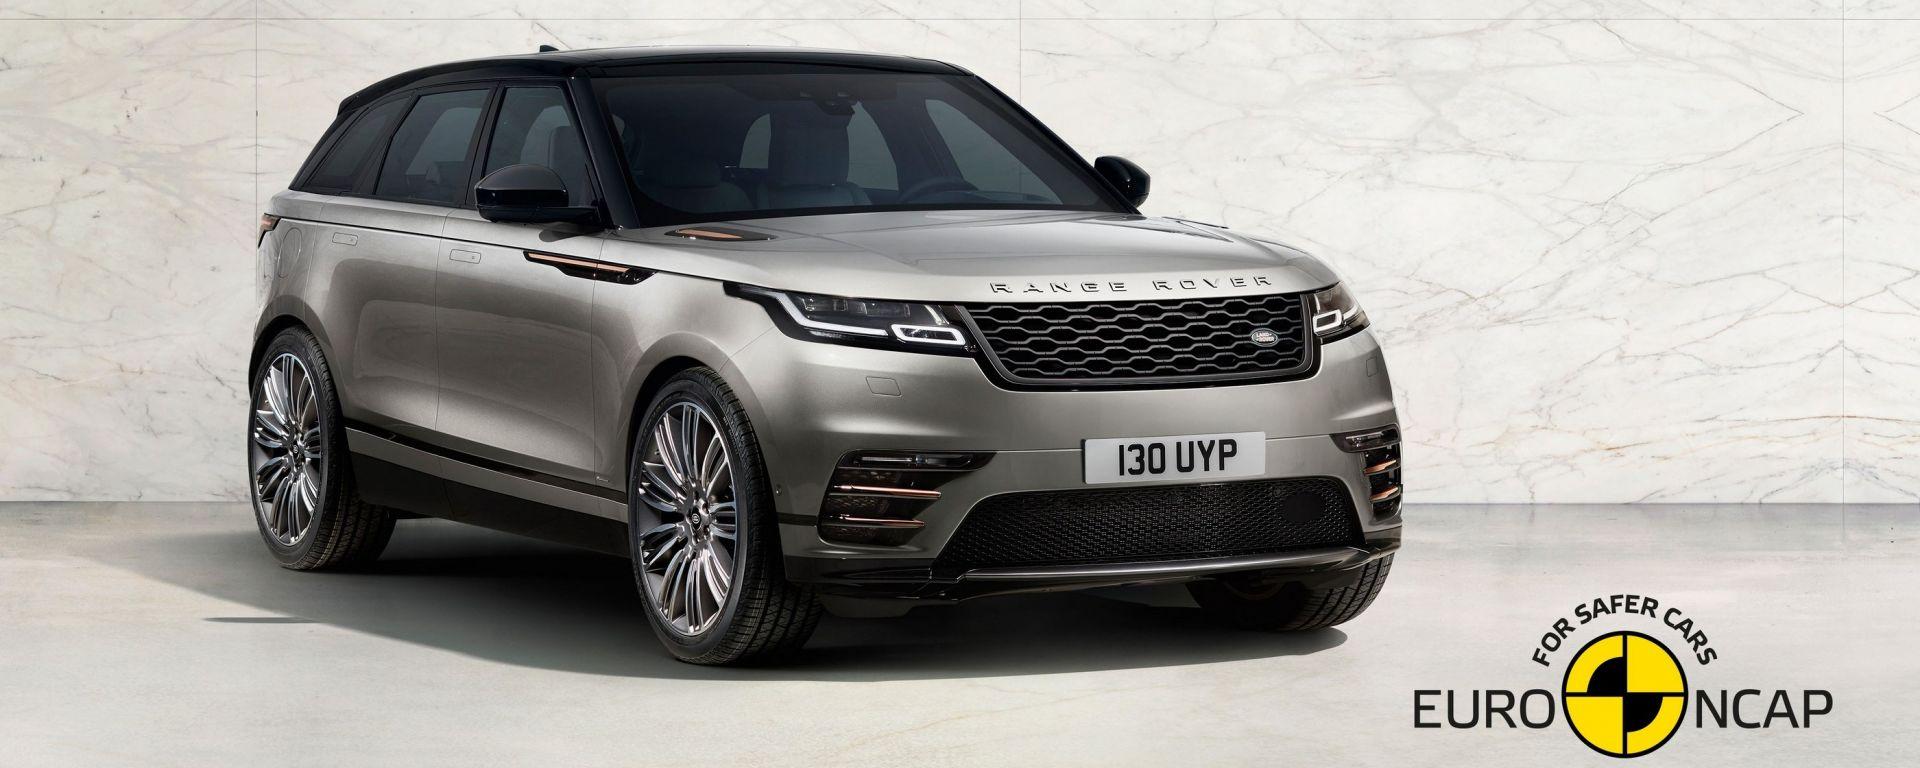 Range Rover Velar: eleganza e sicurezza a 5 stelle